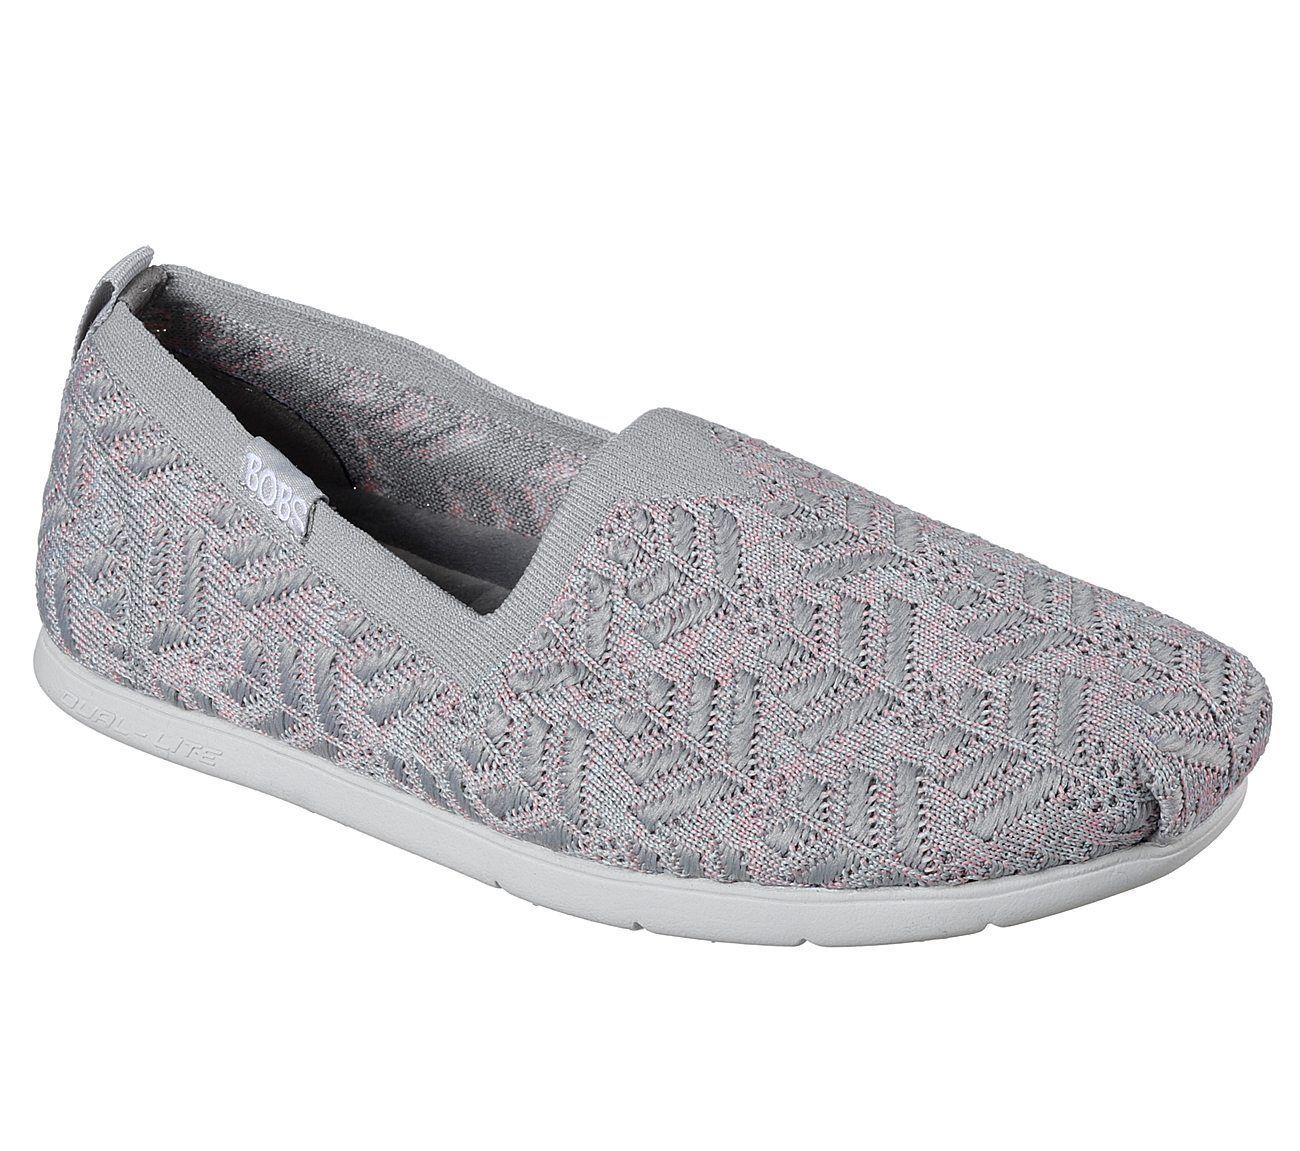 7a6edd1d9b4 BOBS Plush Lite - Plush Life | shoes | Red handbag, Shoes, Skechers